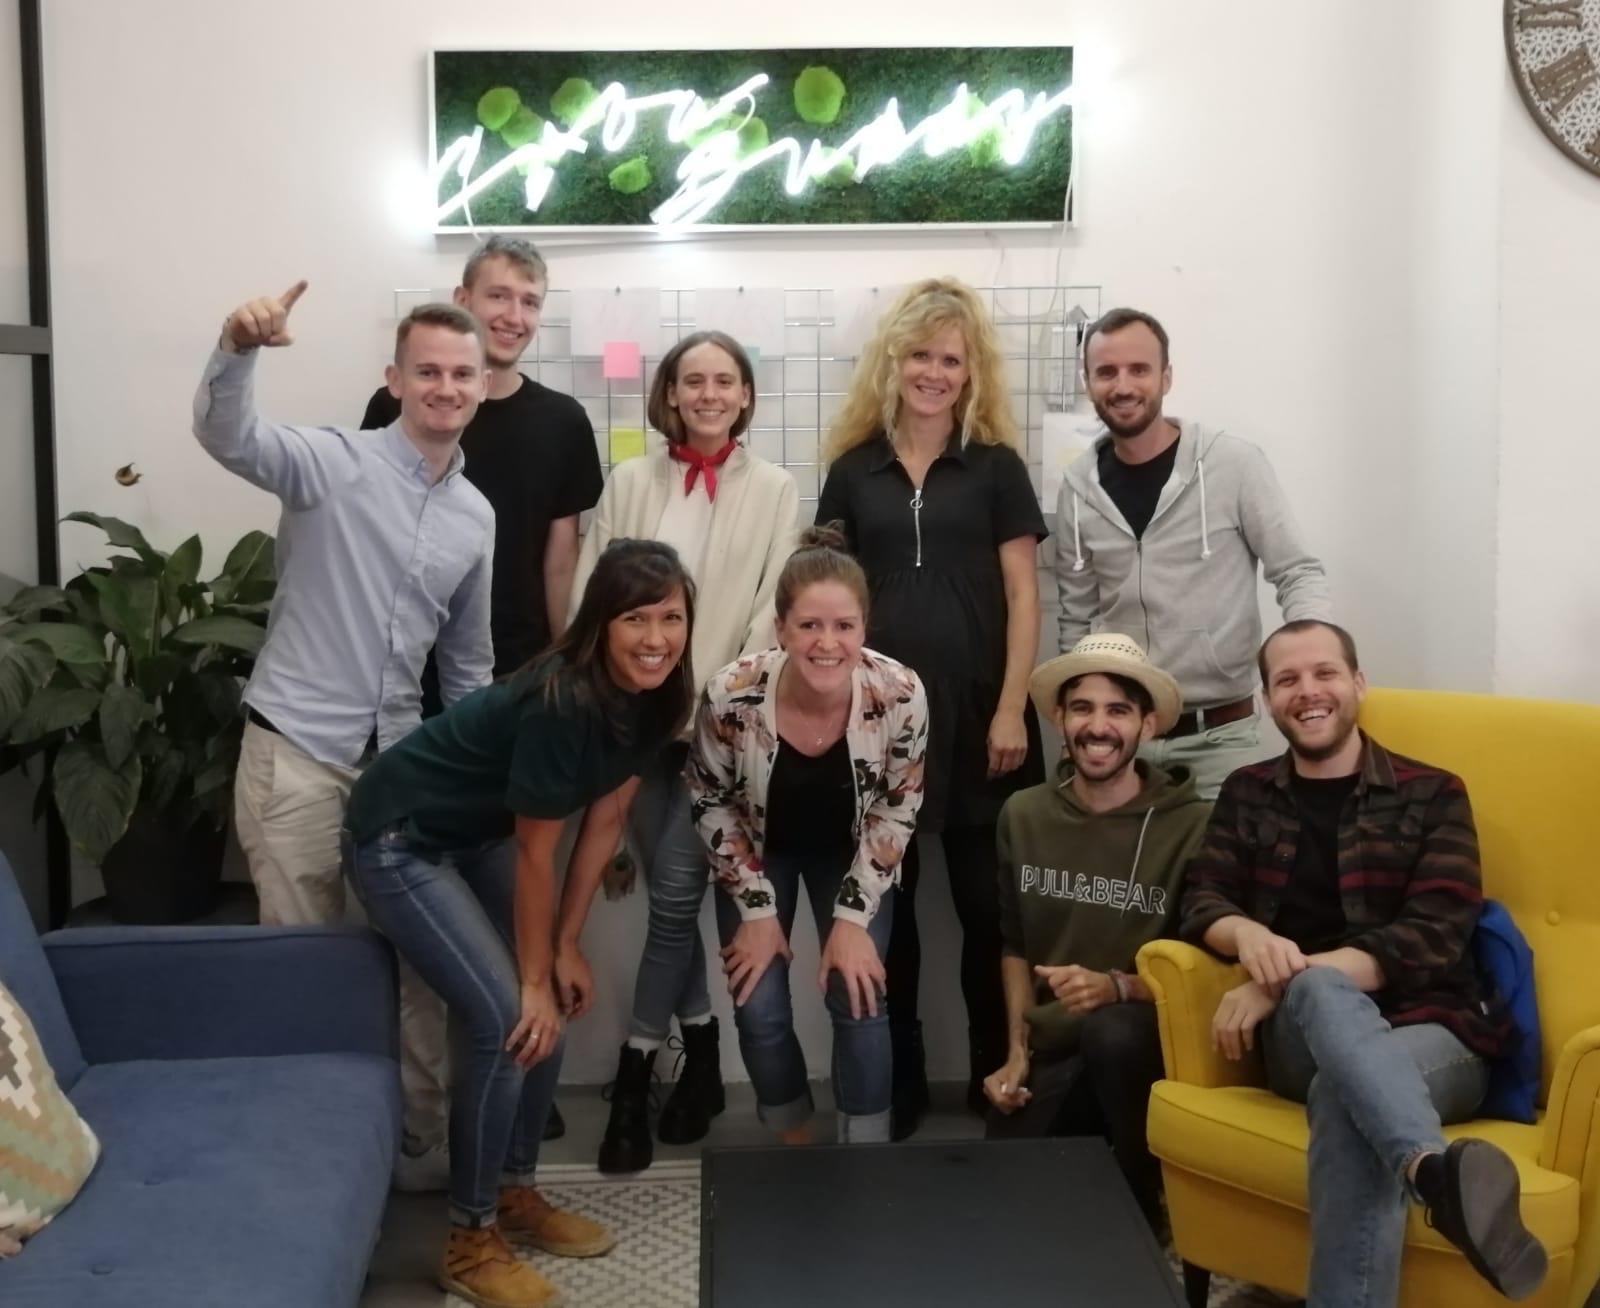 Das Cuba Buddy Team zusammen